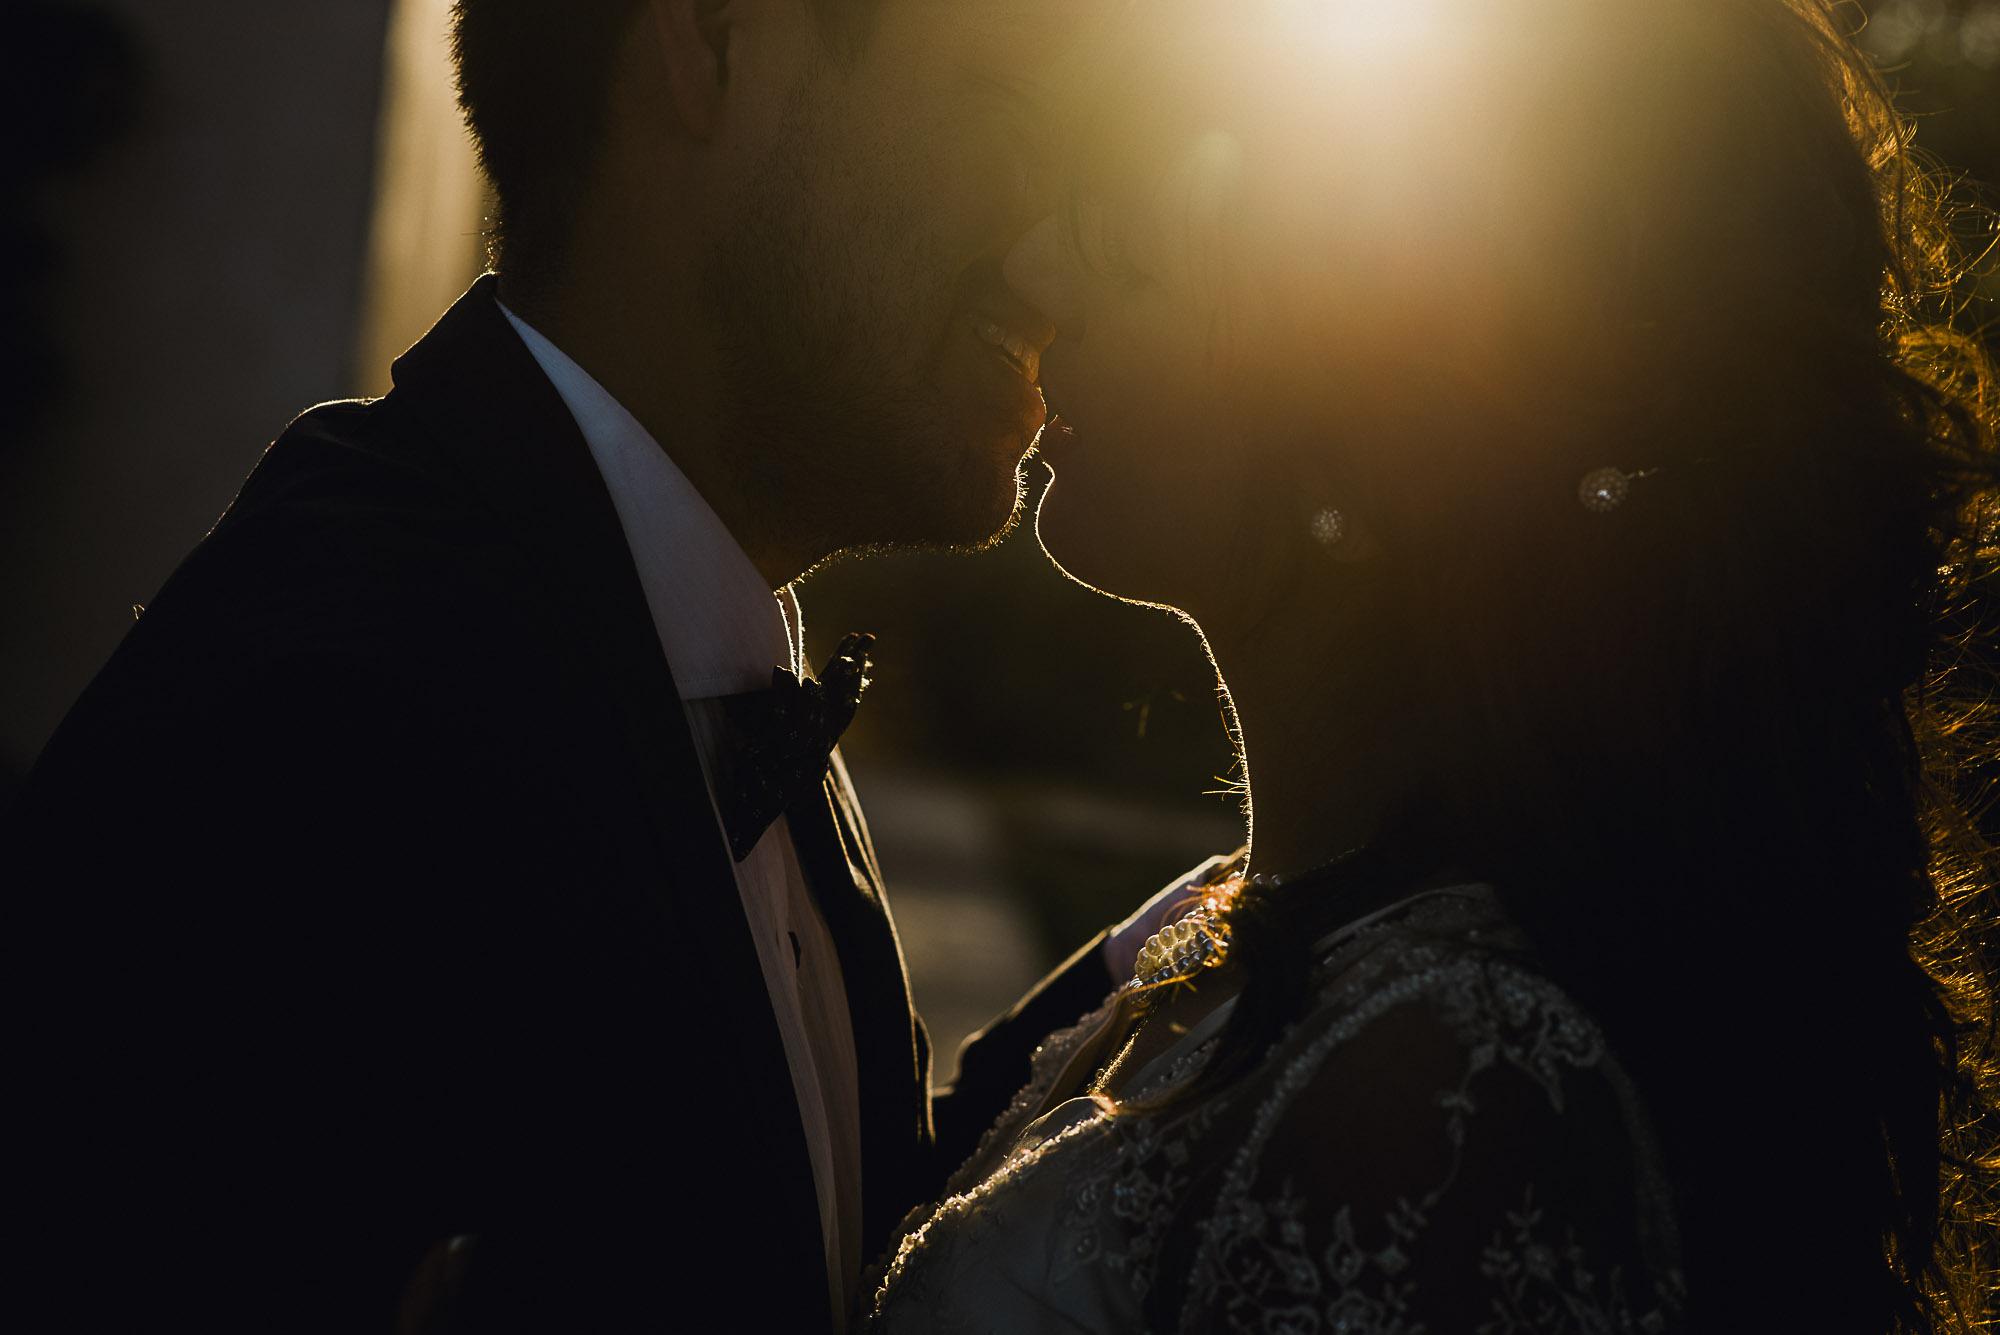 post-boda-trash-the-dress-marifer-y-felix-fotografia-de-bodas-en-patagonia-gabriel-roa-photography-7